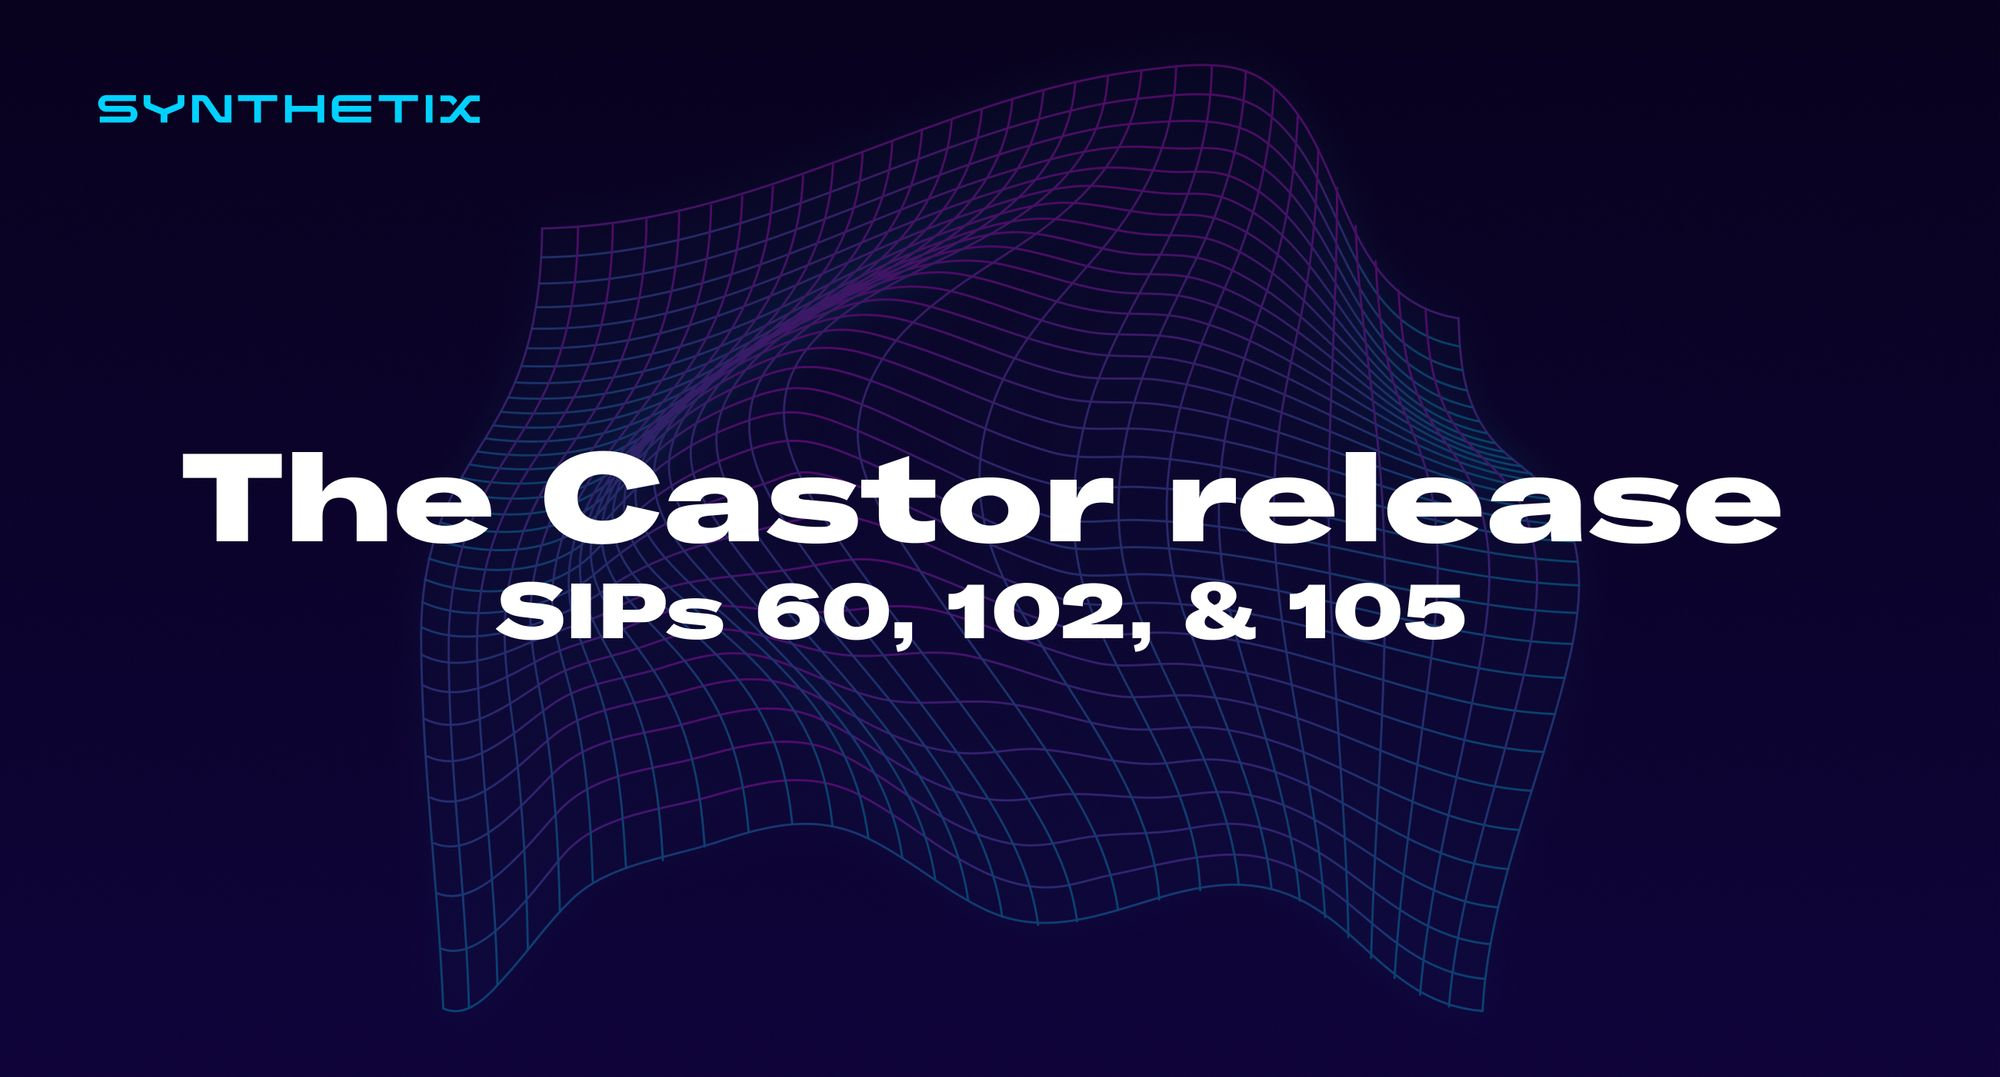 The Castor release